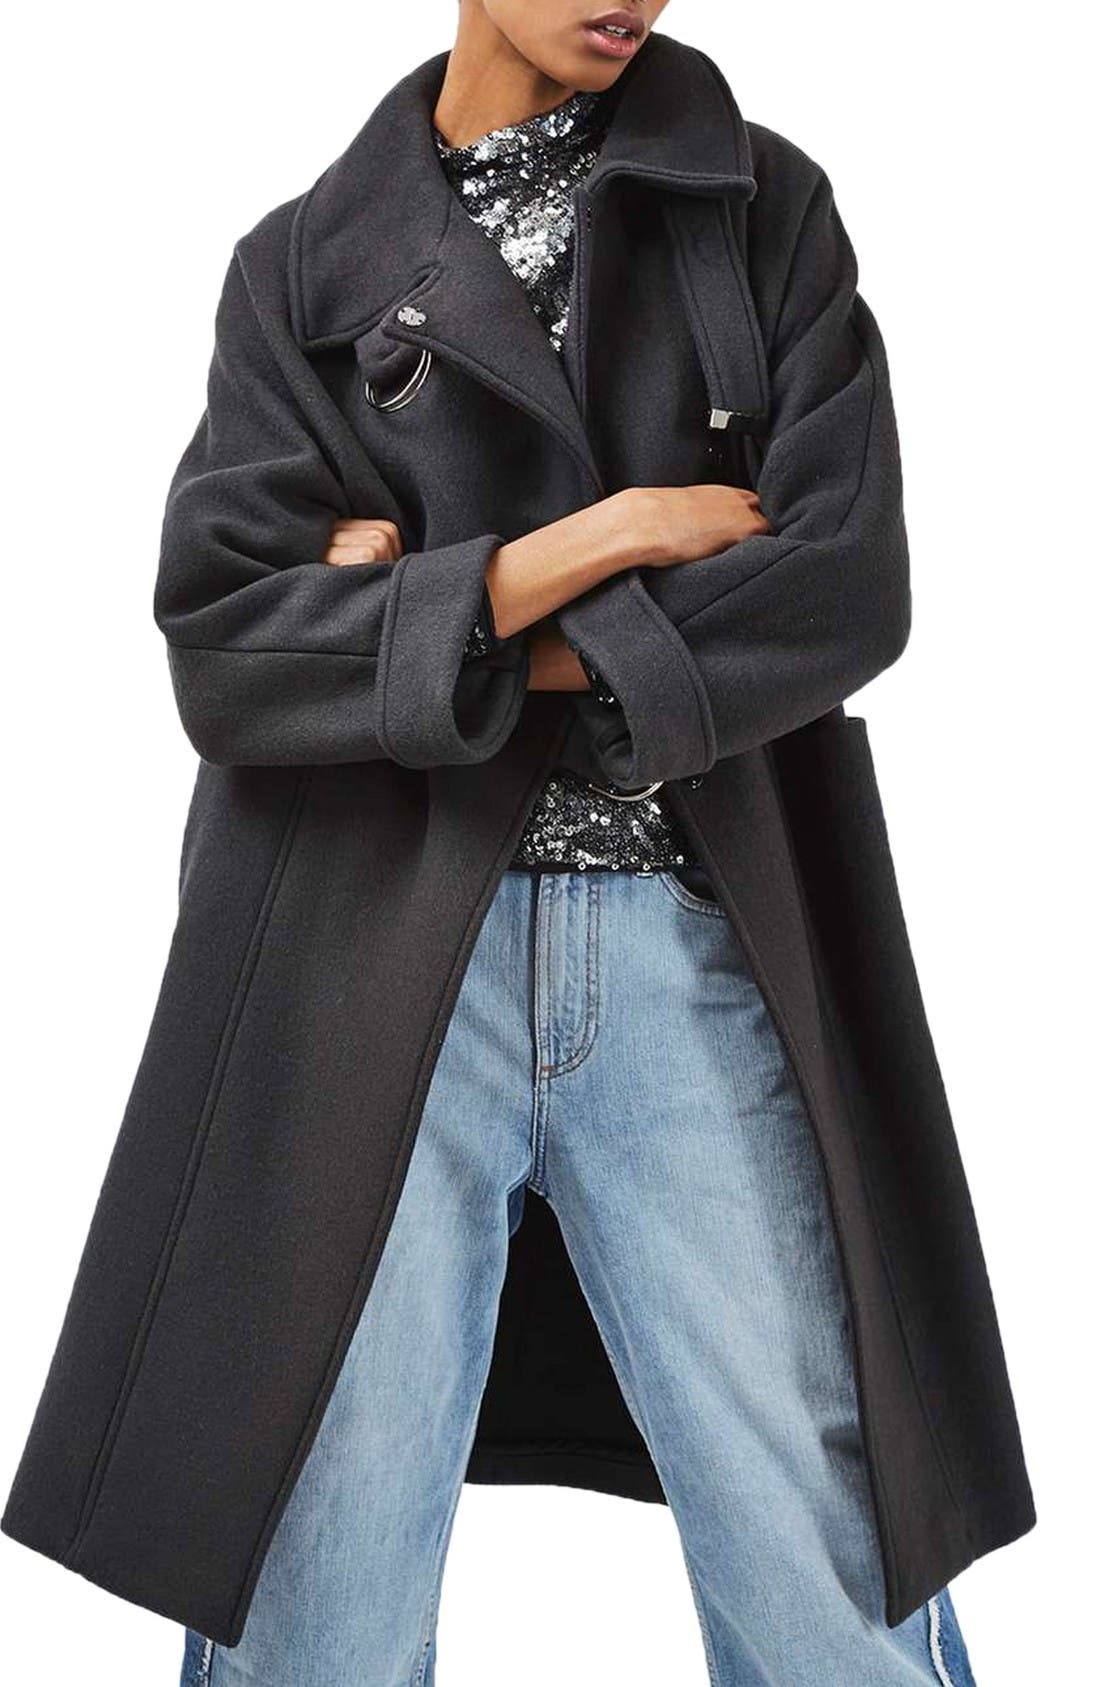 Main Image - Topshop Wool Blend Coat